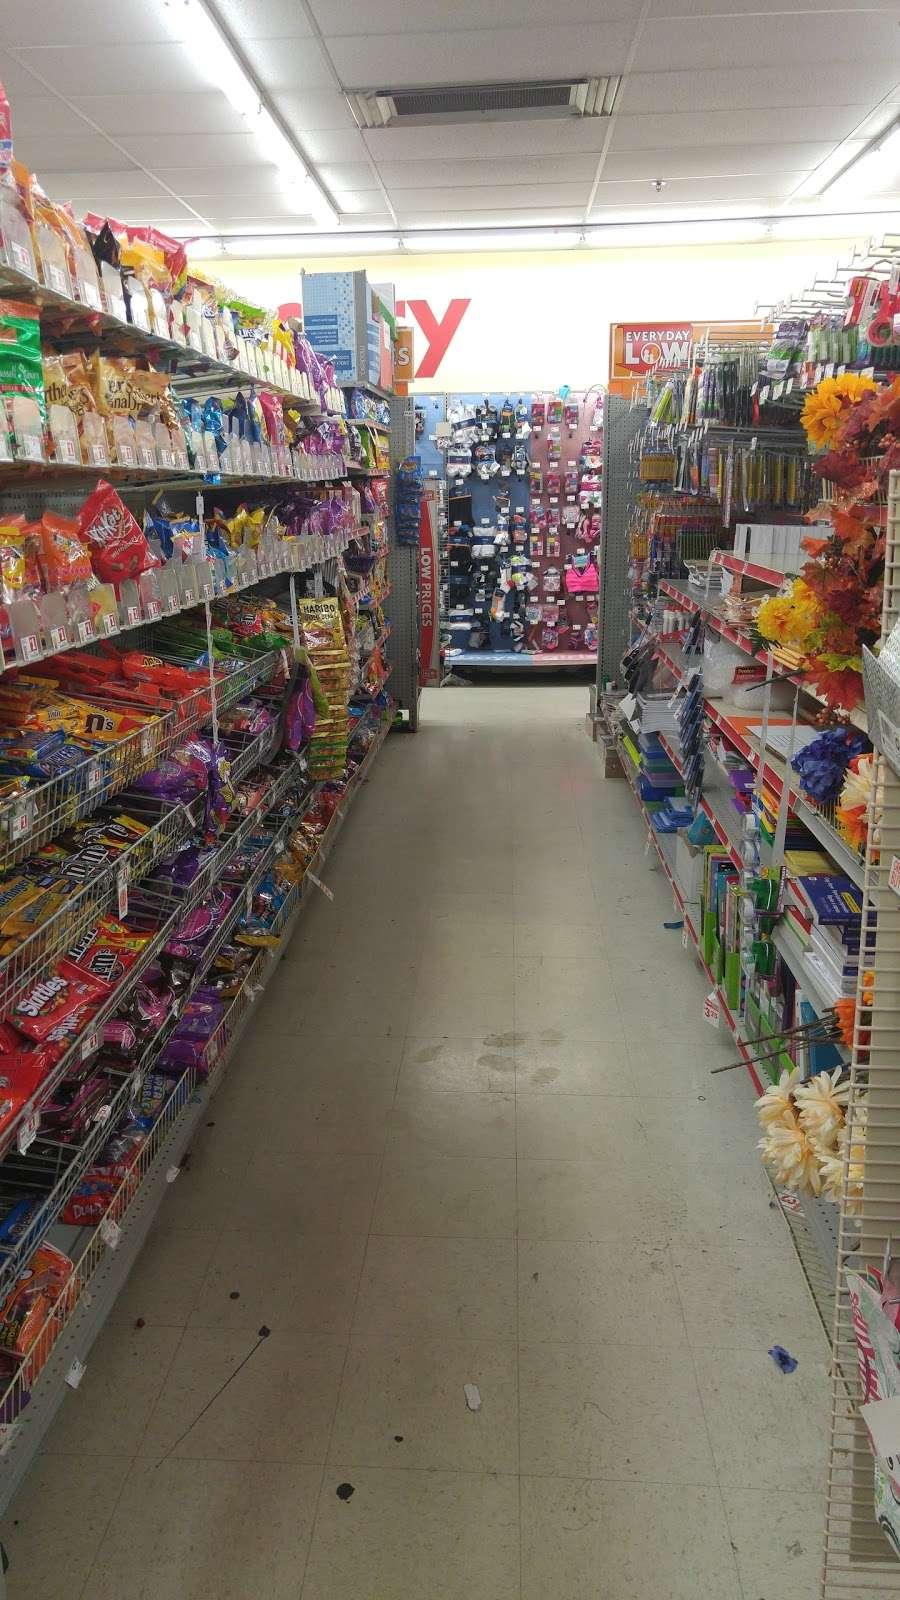 Family Dollar - supermarket  | Photo 3 of 4 | Address: 5648 Lancaster Ave Ste 15, Philadelphia, PA 19131, USA | Phone: (215) 877-2907